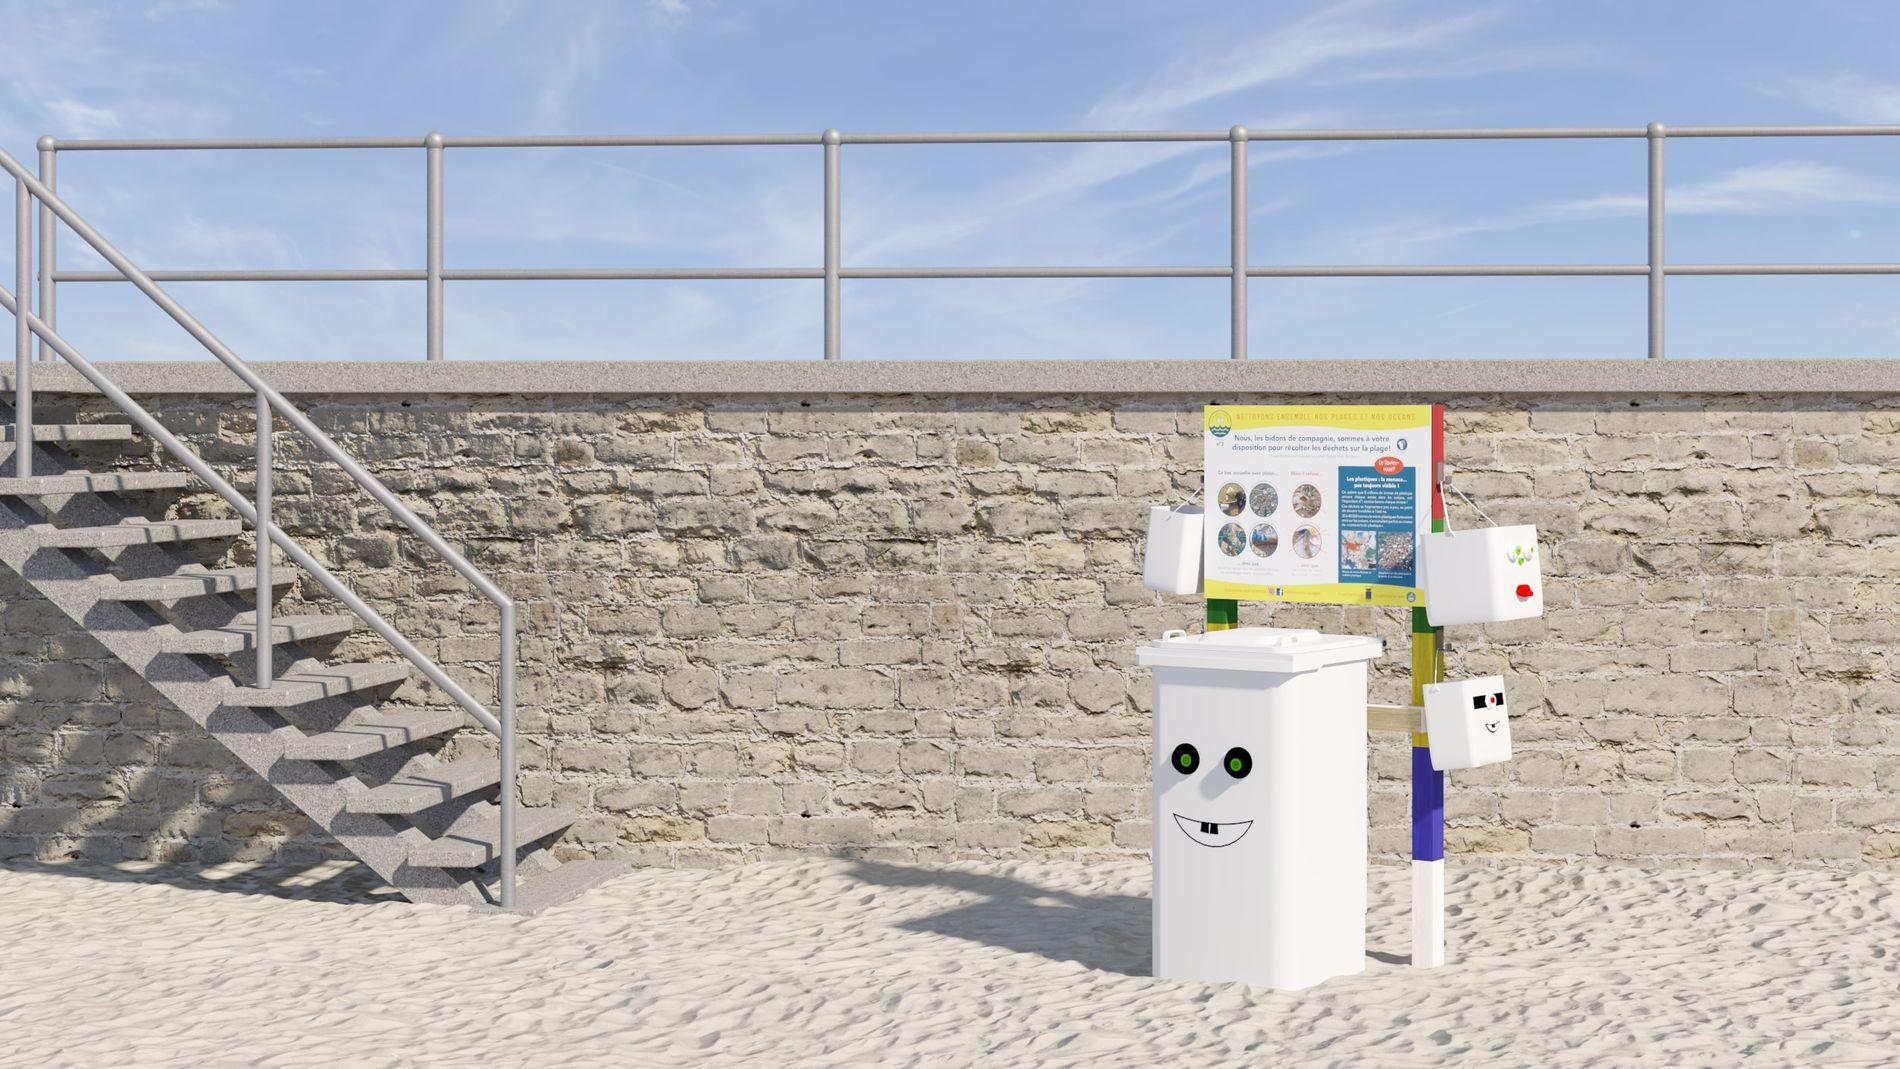 les-bidons-de-compagnie-free-spirited-nettoyer-plage